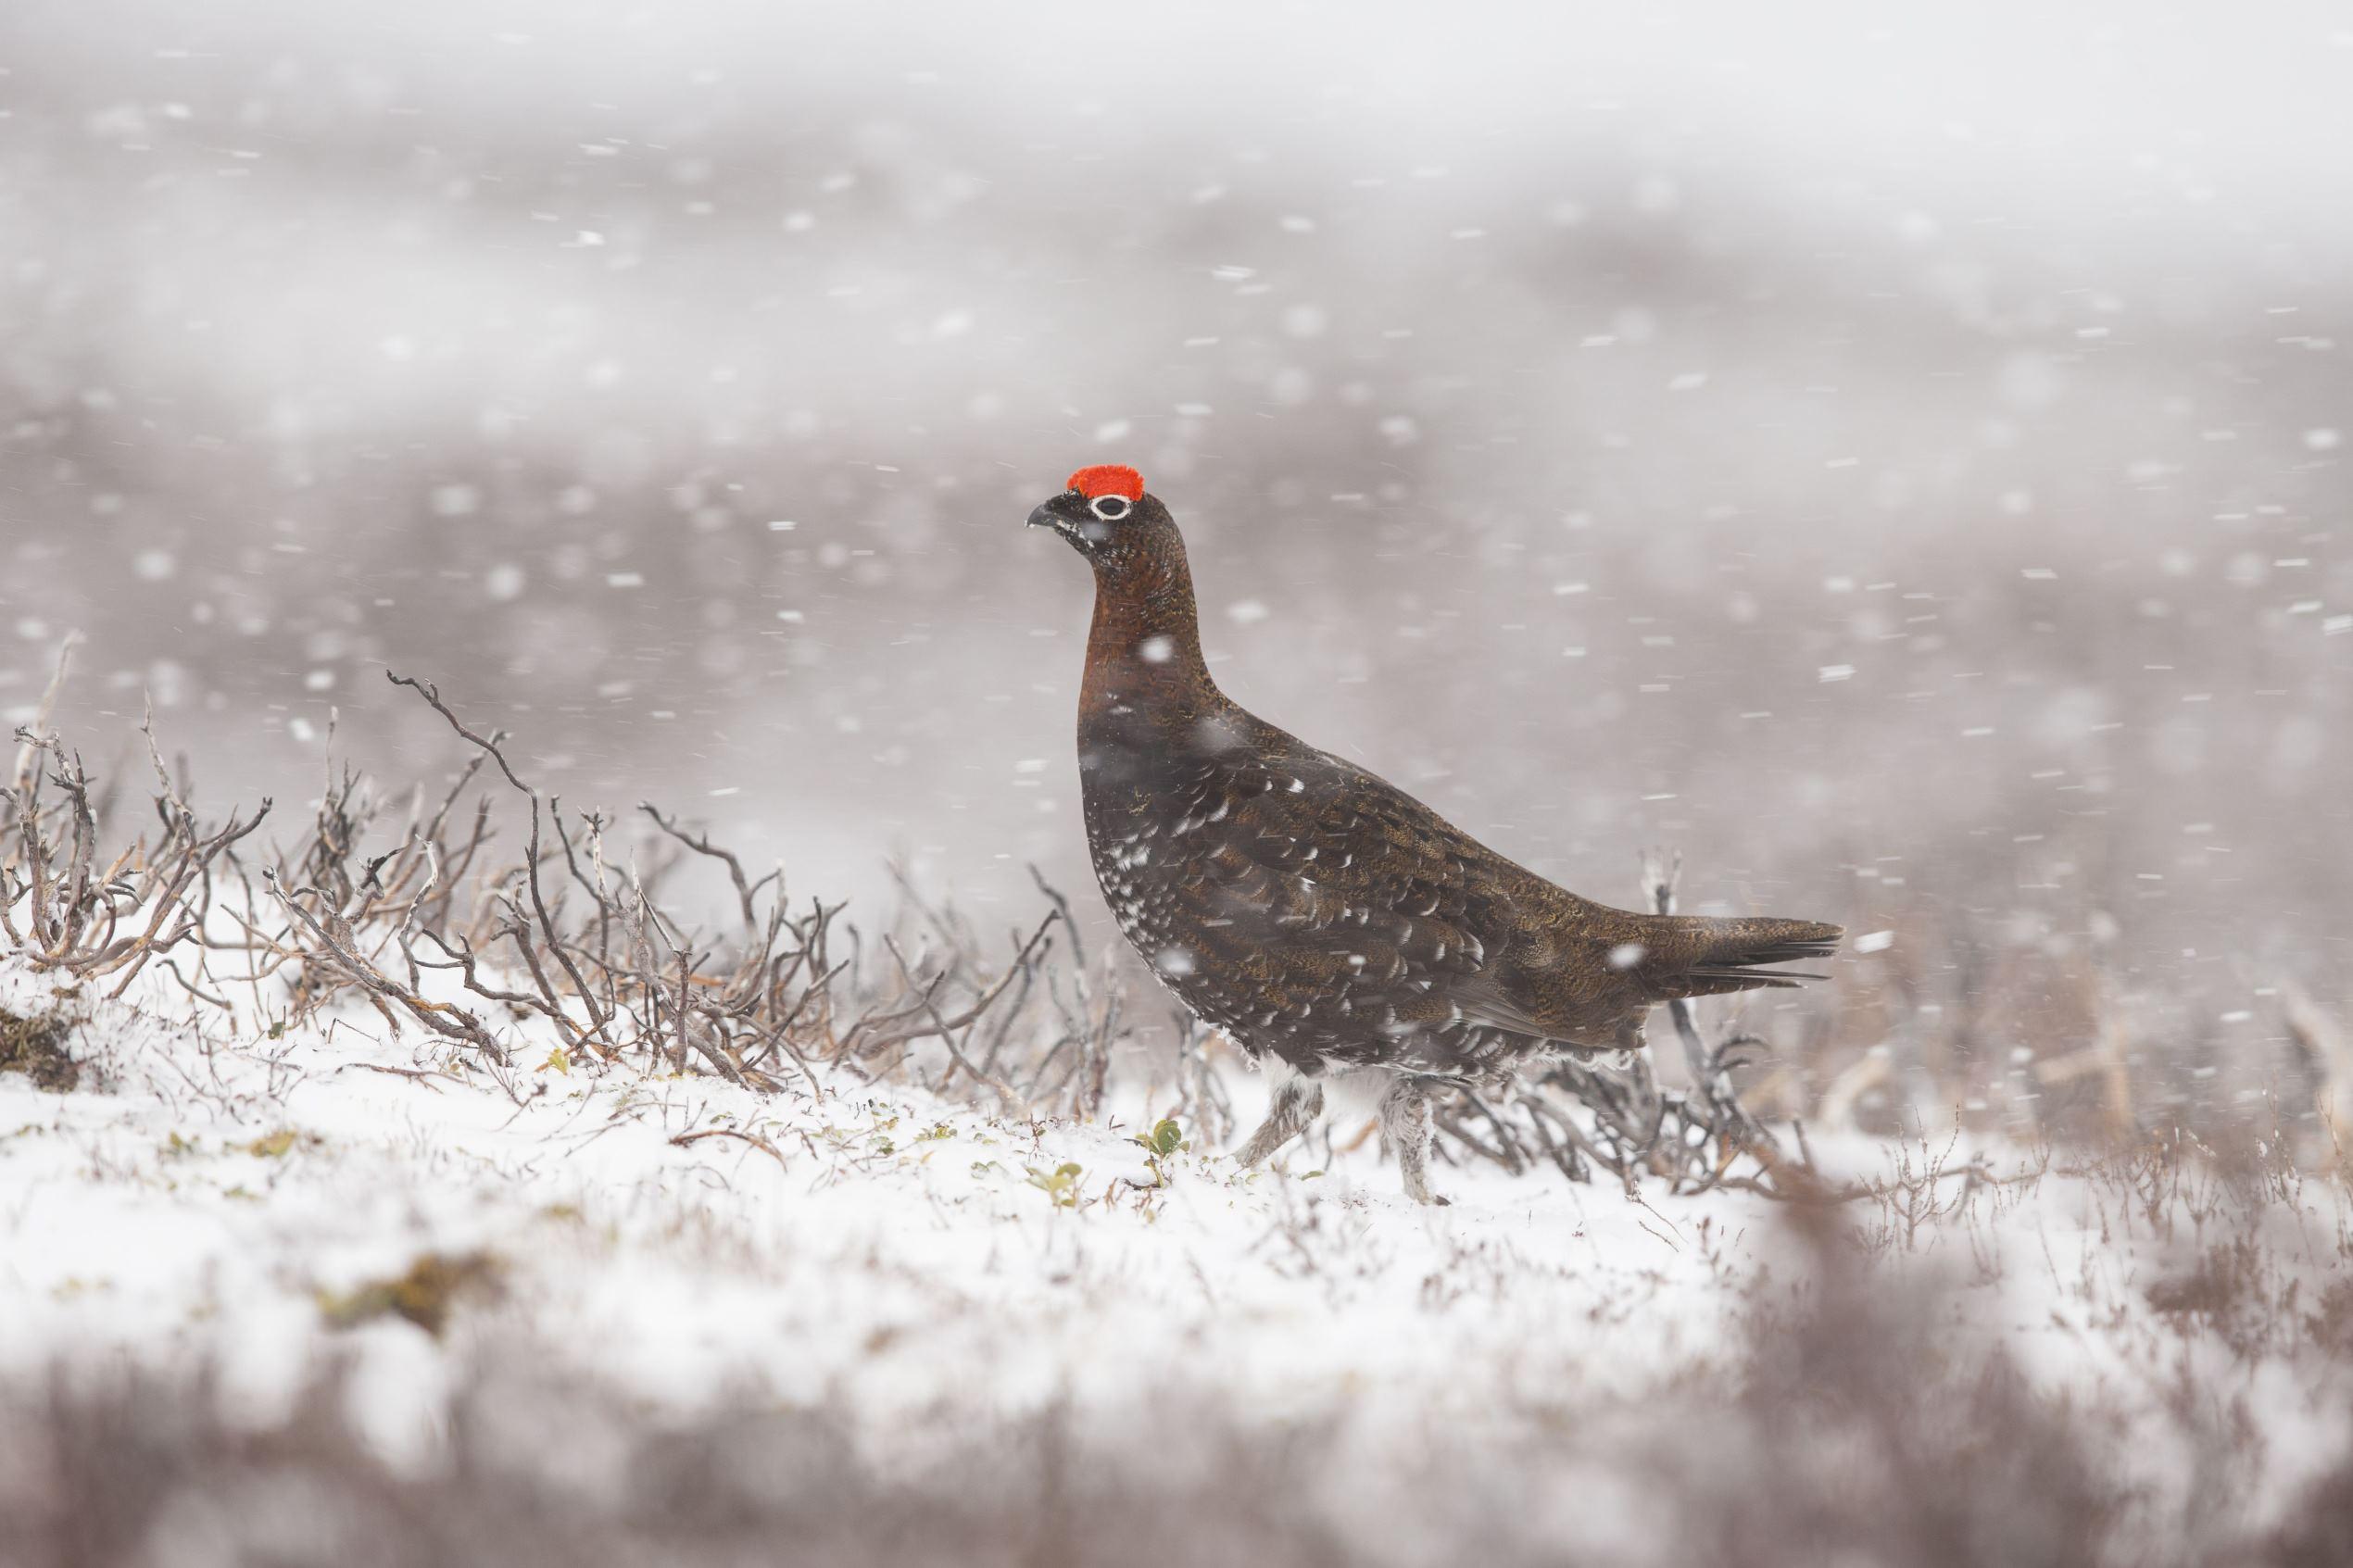 Слайд 41 из 67: Snow in Aberdeenshire, Scotland, Britain - 25 Apr 2016 Red Grouse (Lagopus lagopus scoticus) amongst heather in snow